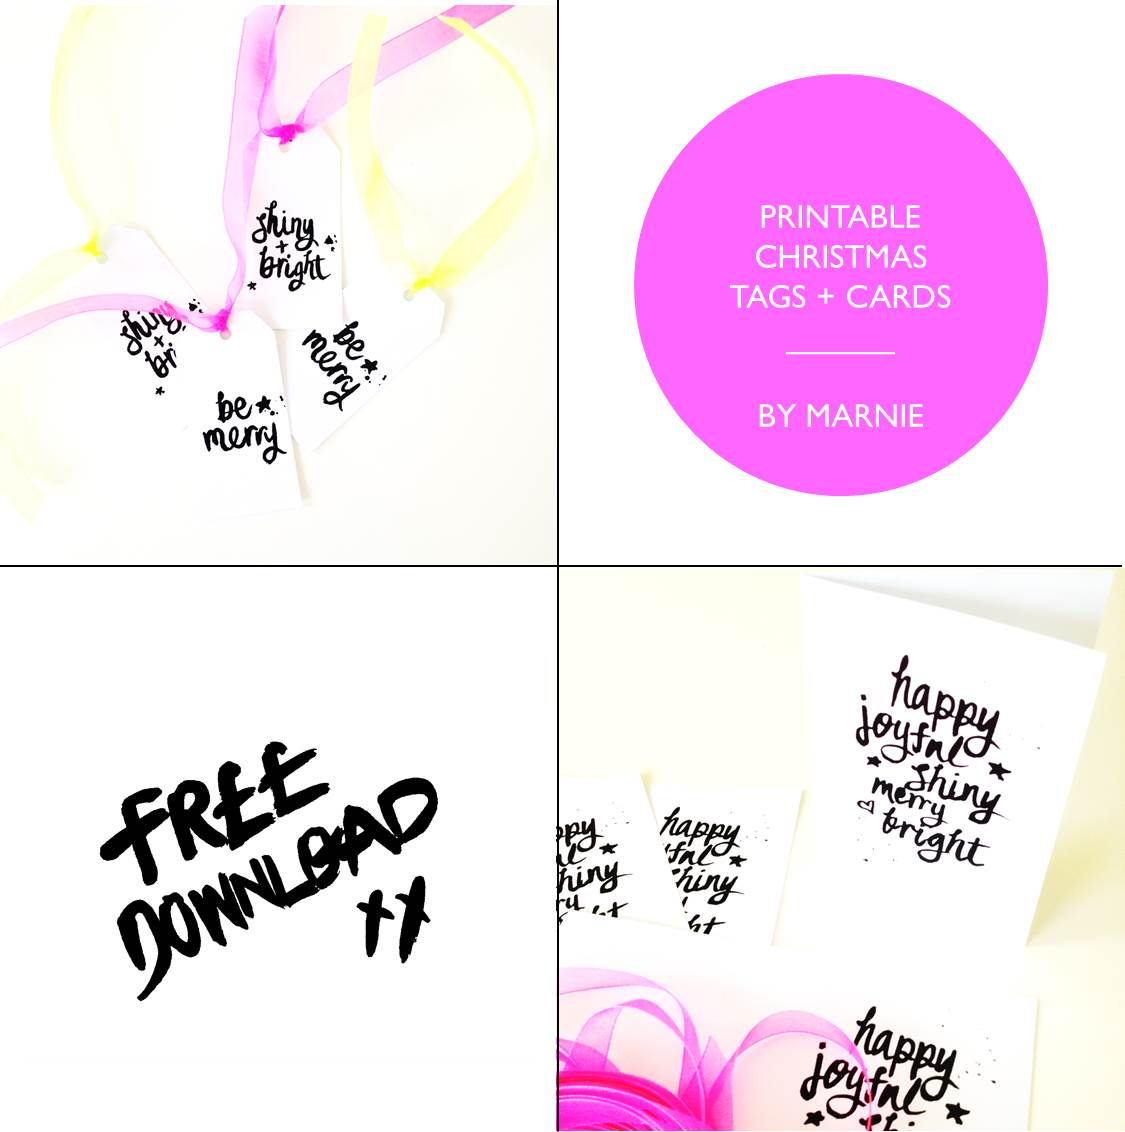 Christmas 2014 printable tags + cards by Marnie McDermott